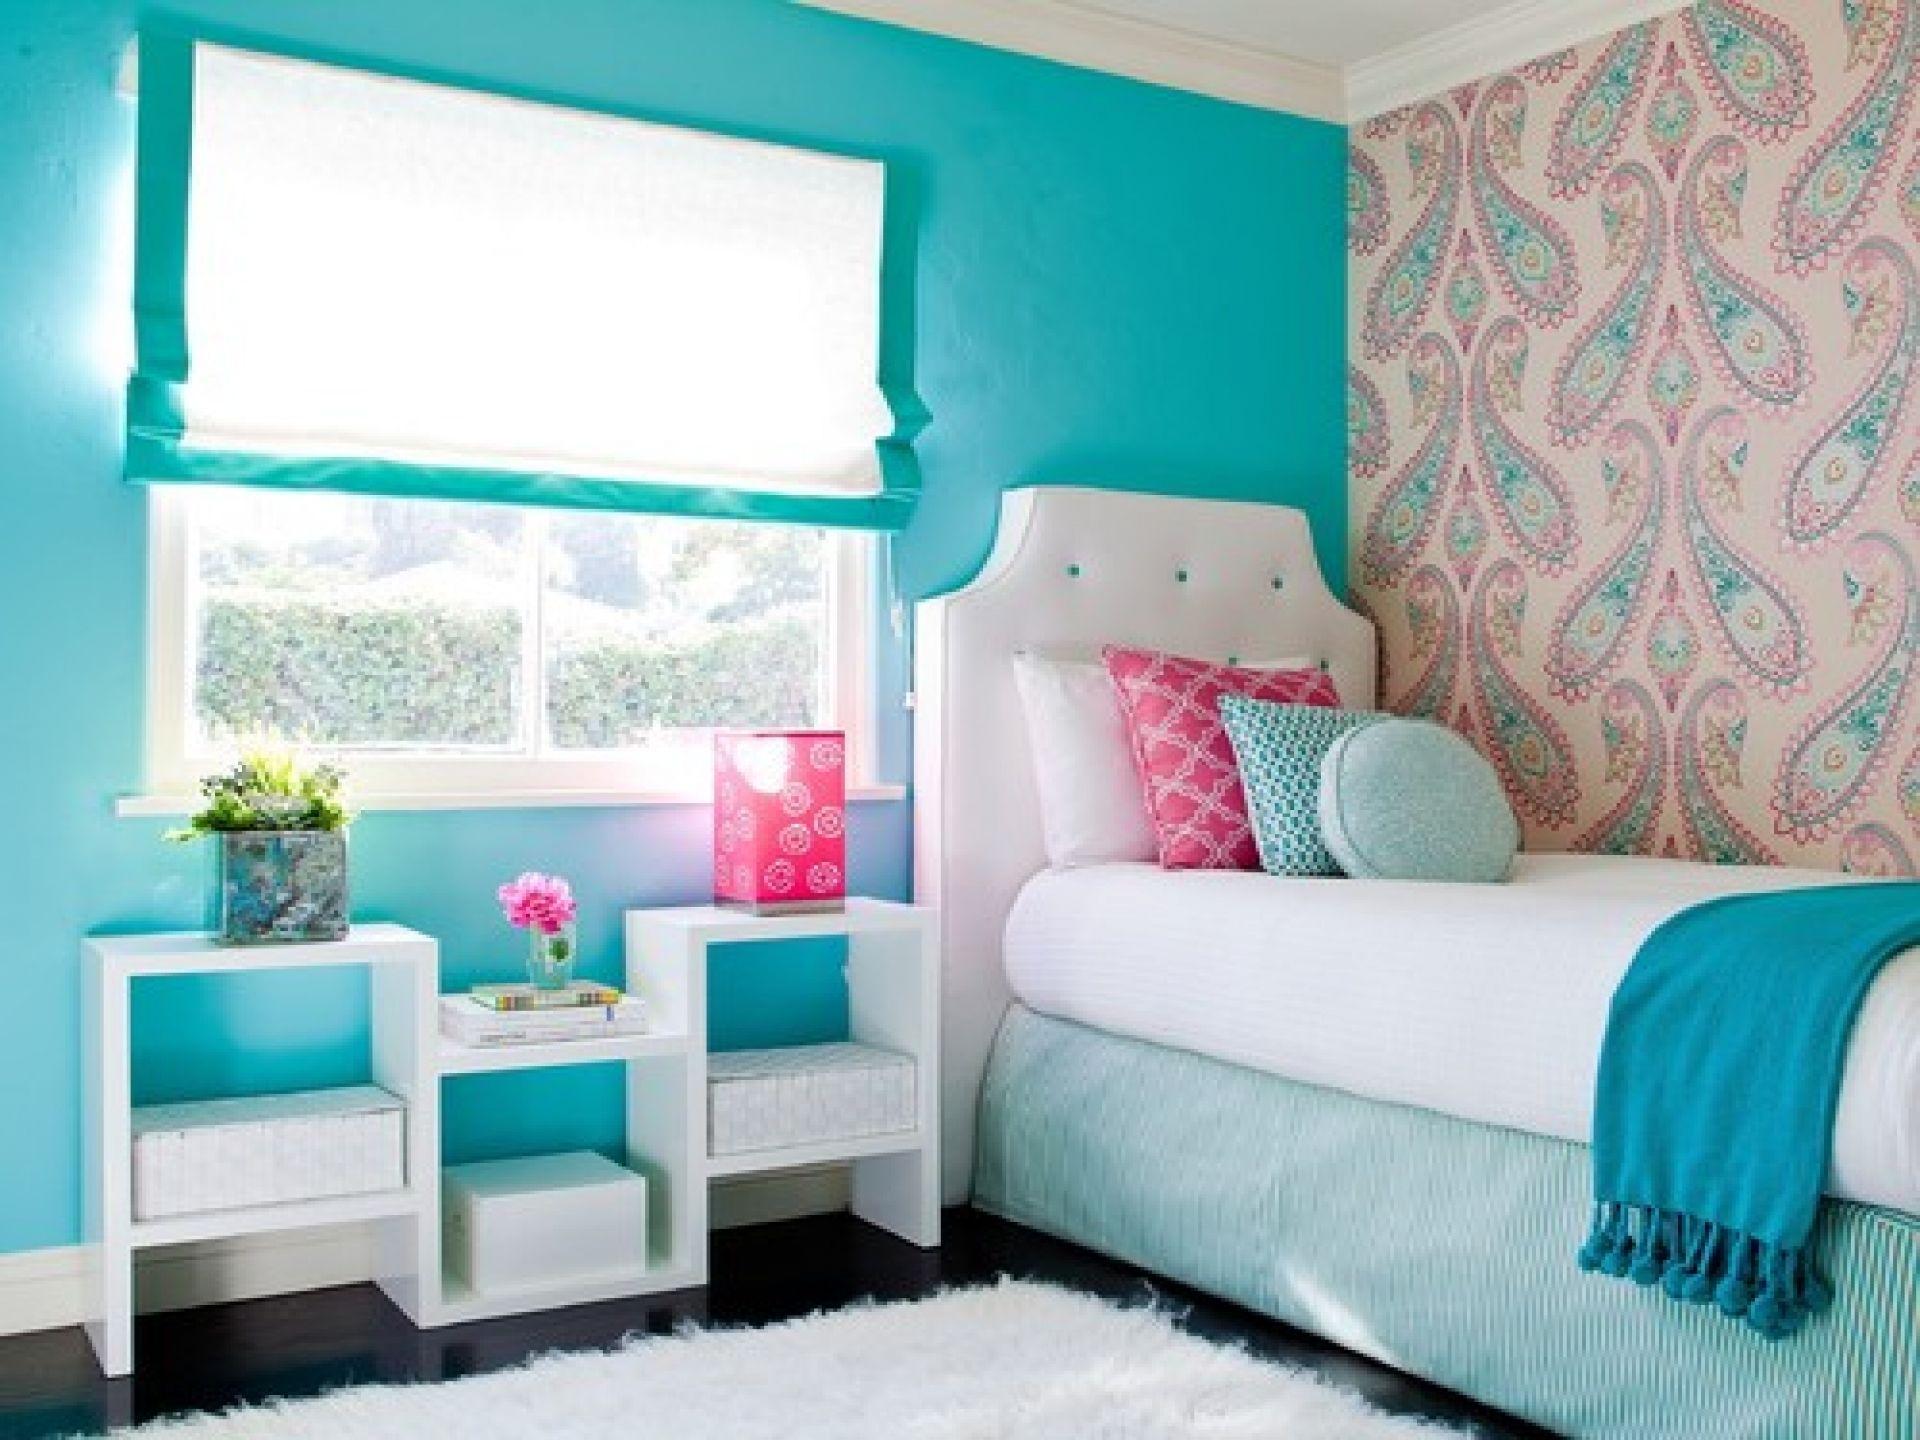 Bedroom designs for girls blue - 30 Beautiful Bedroom Designs For Teenage Girls Beautiful Teenage Girls Light Blue Bedroom Ideas